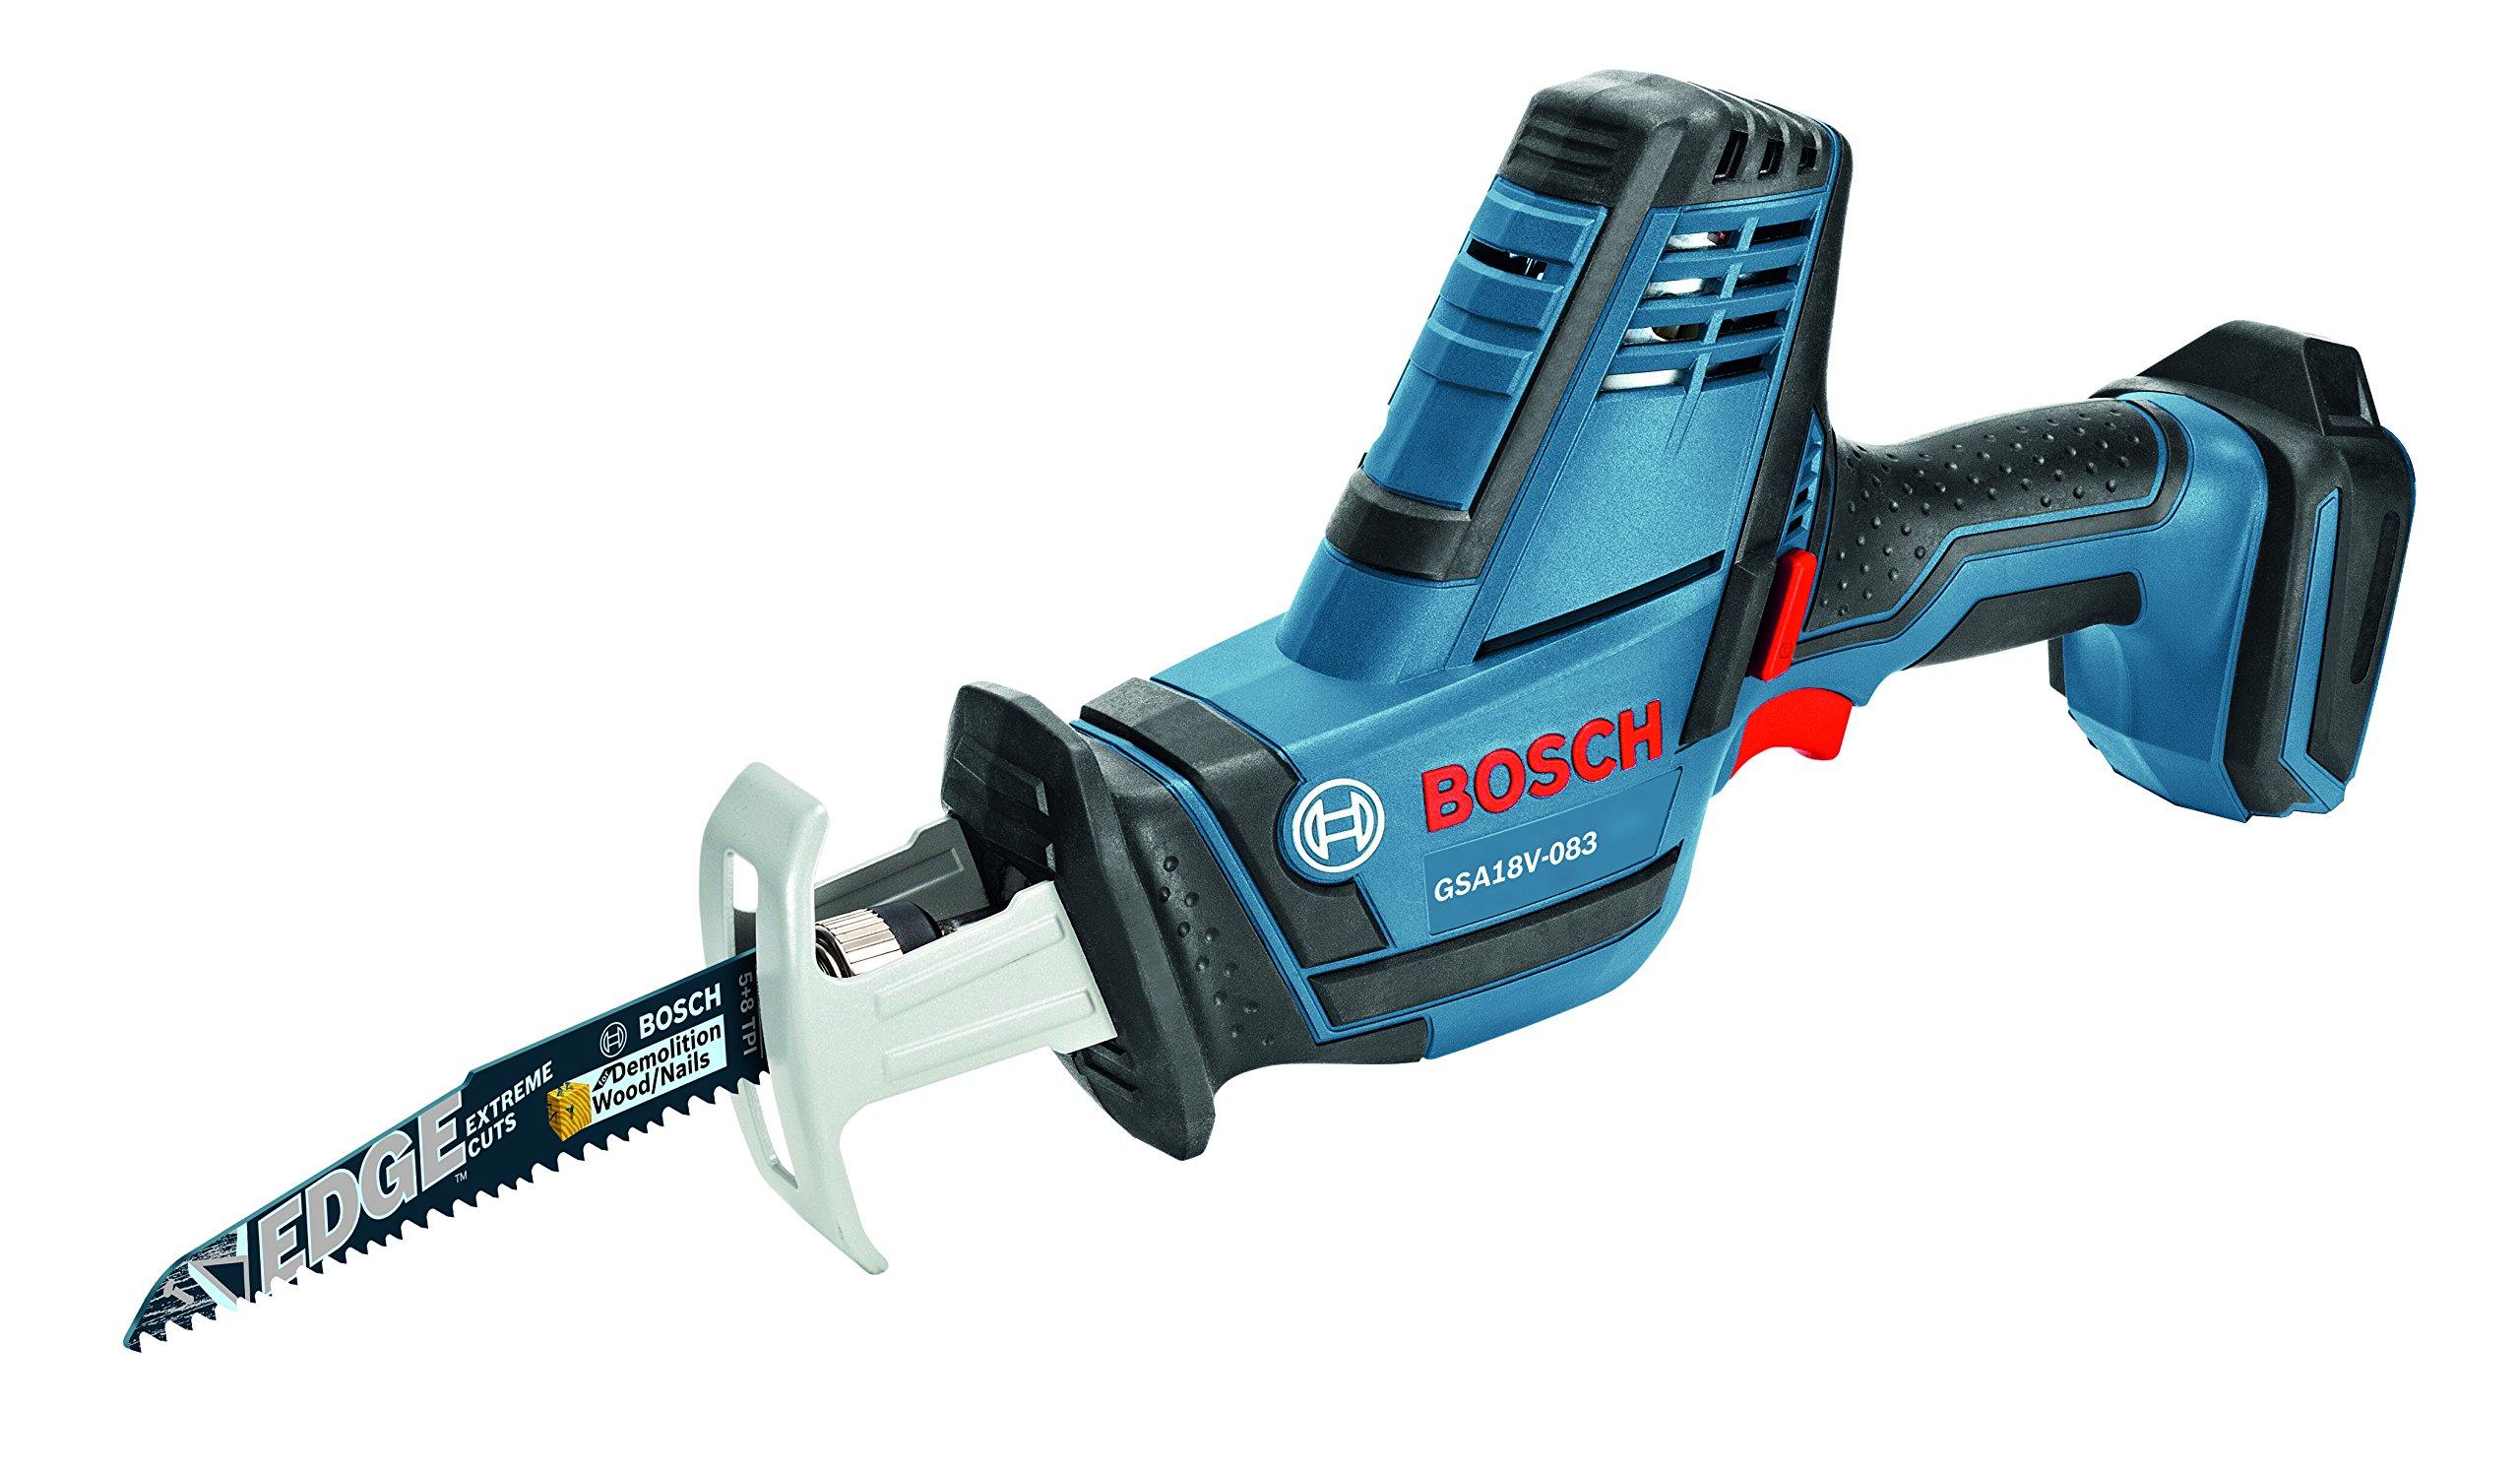 Bosch GSA18V-083B Reciprocating Saw